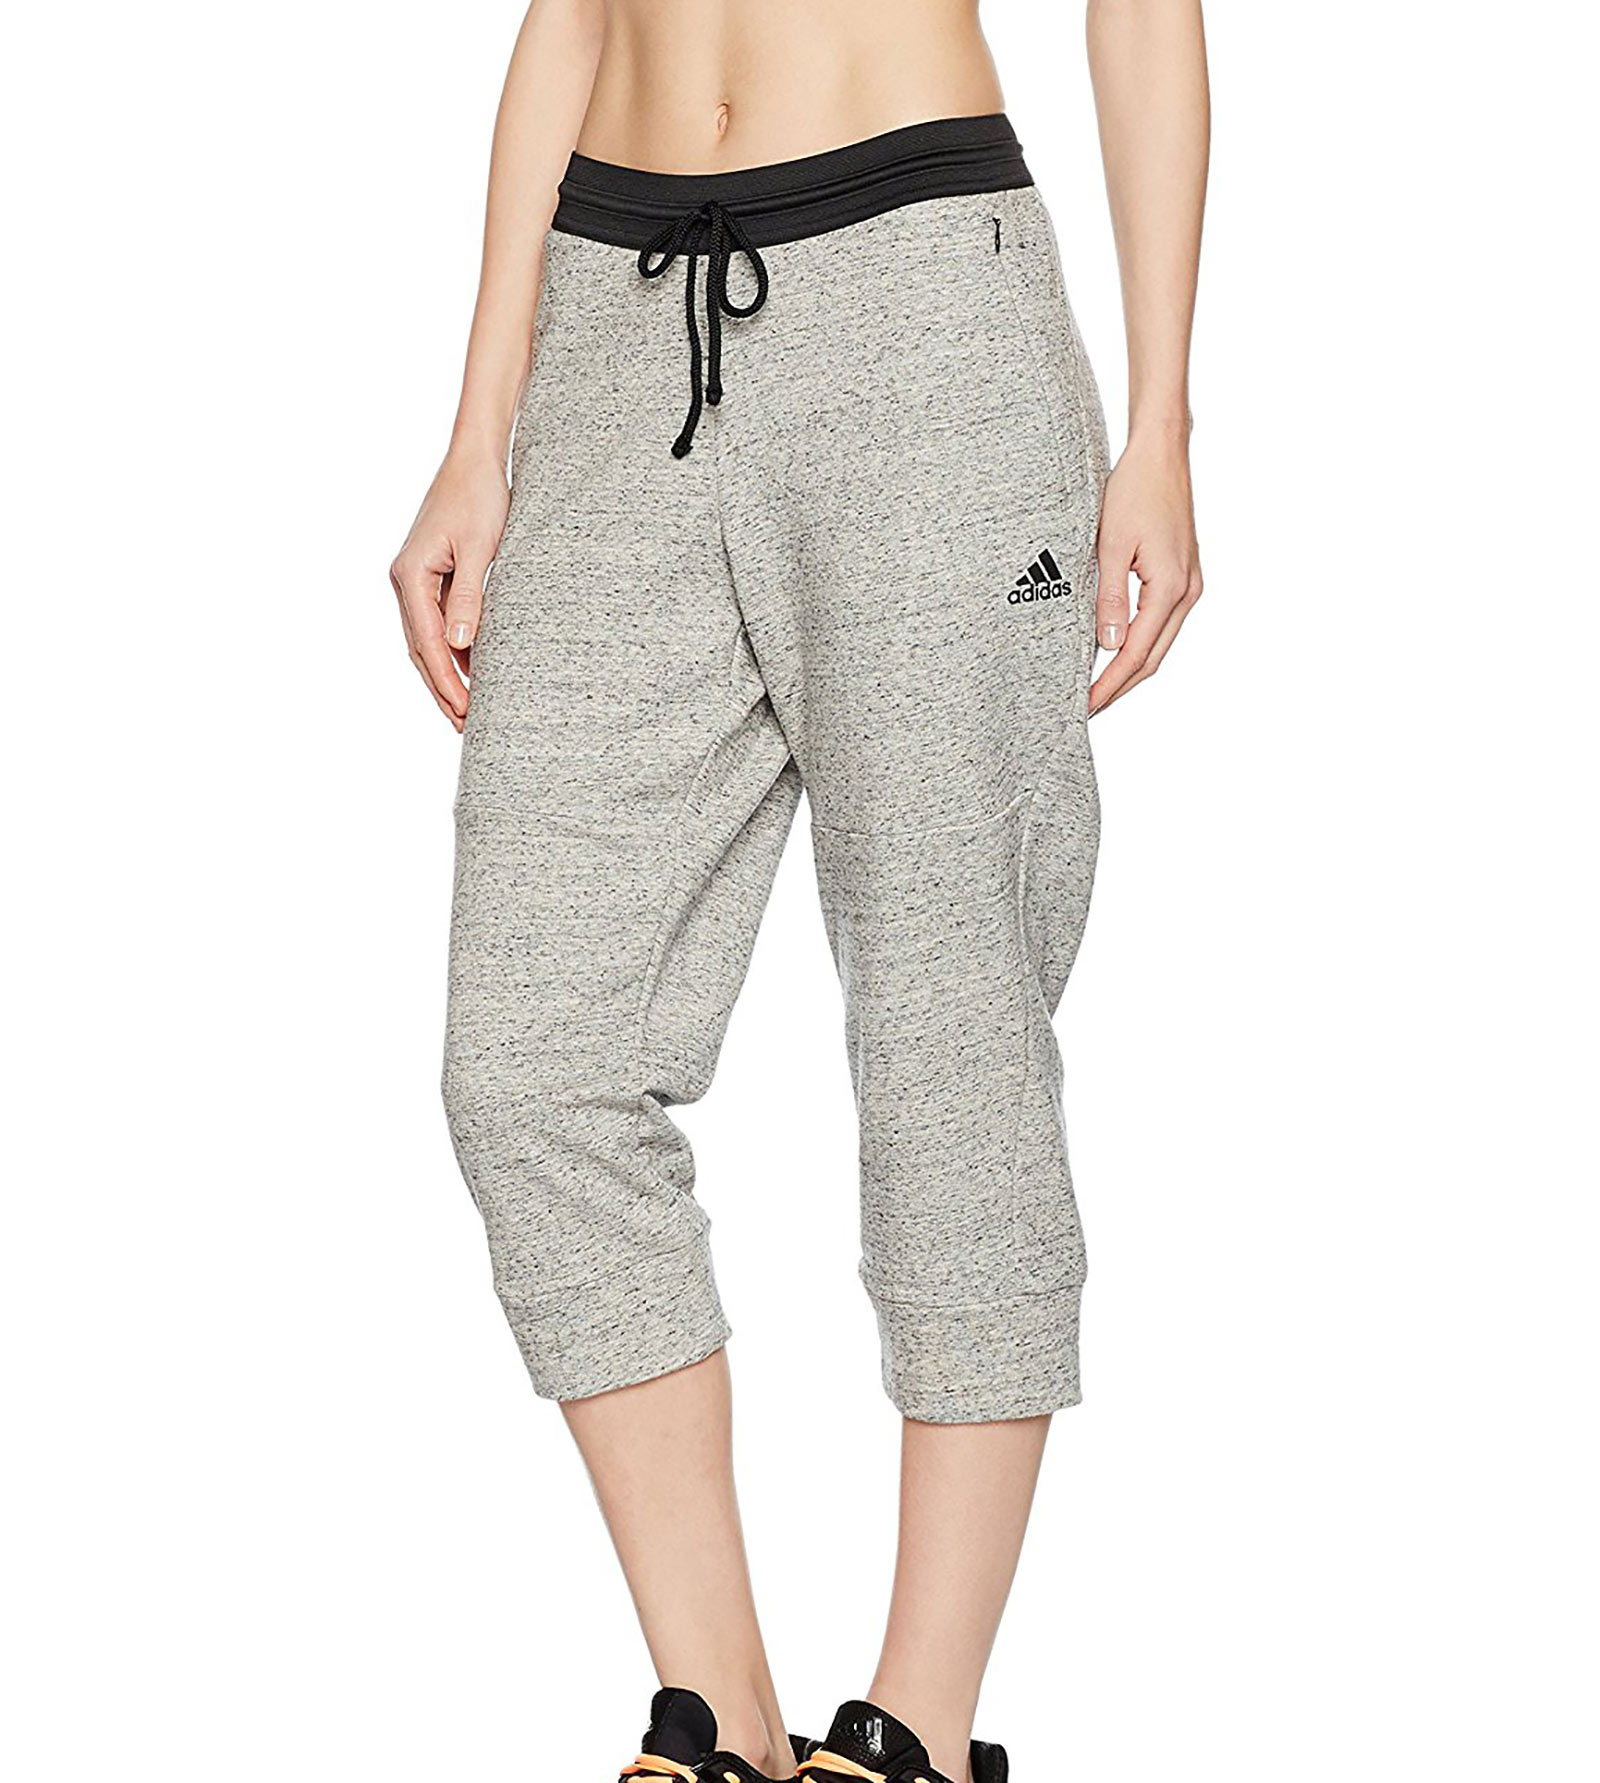 New adidas womens cotton fleece 34 pants all sizes | eBay